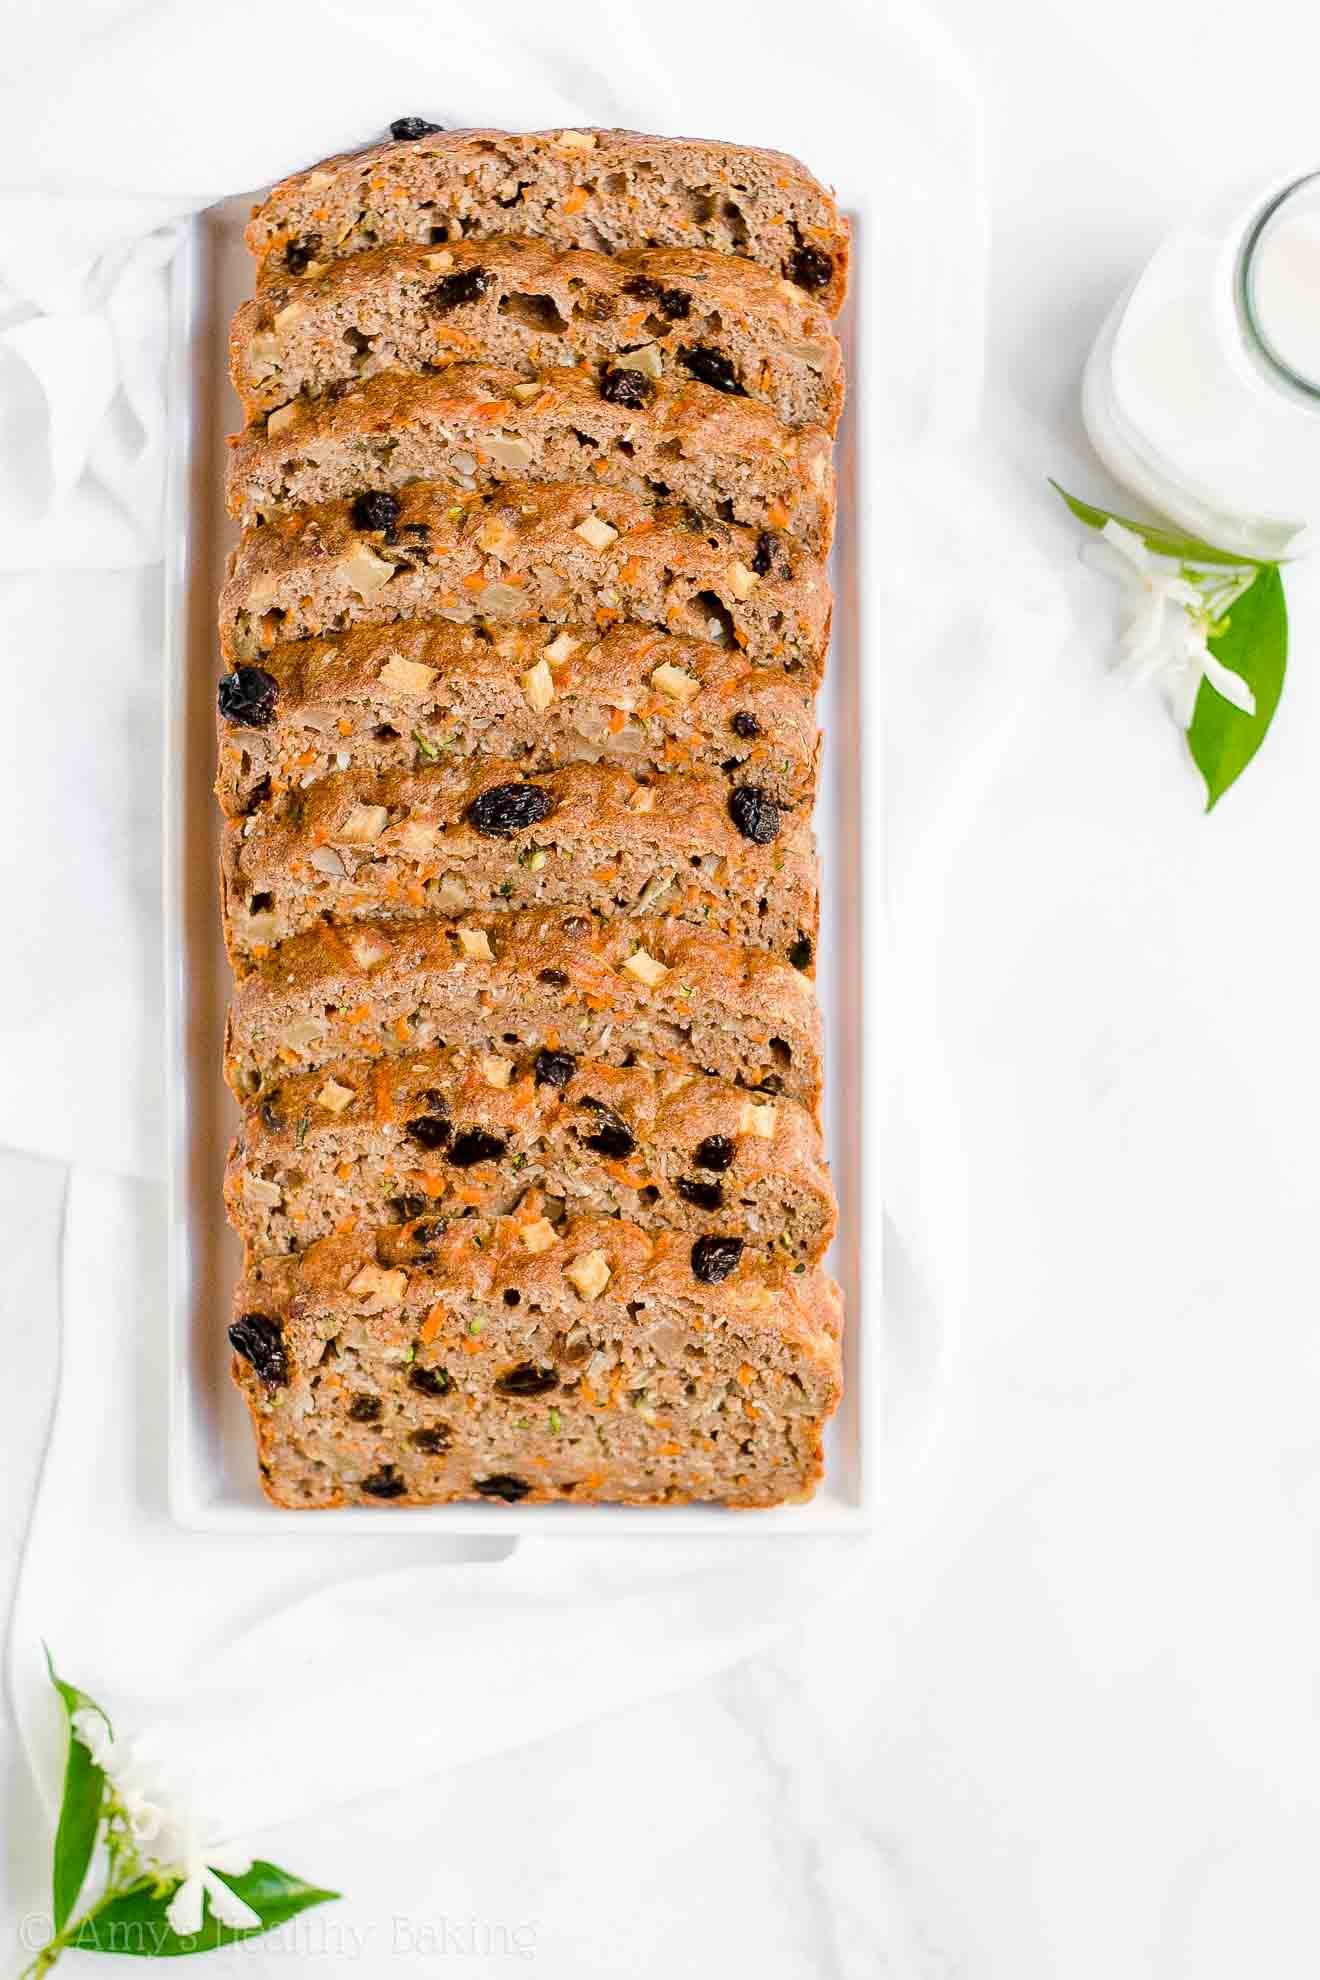 Healthy Gluten Free Morning Glory Zucchini Bread with no sugar